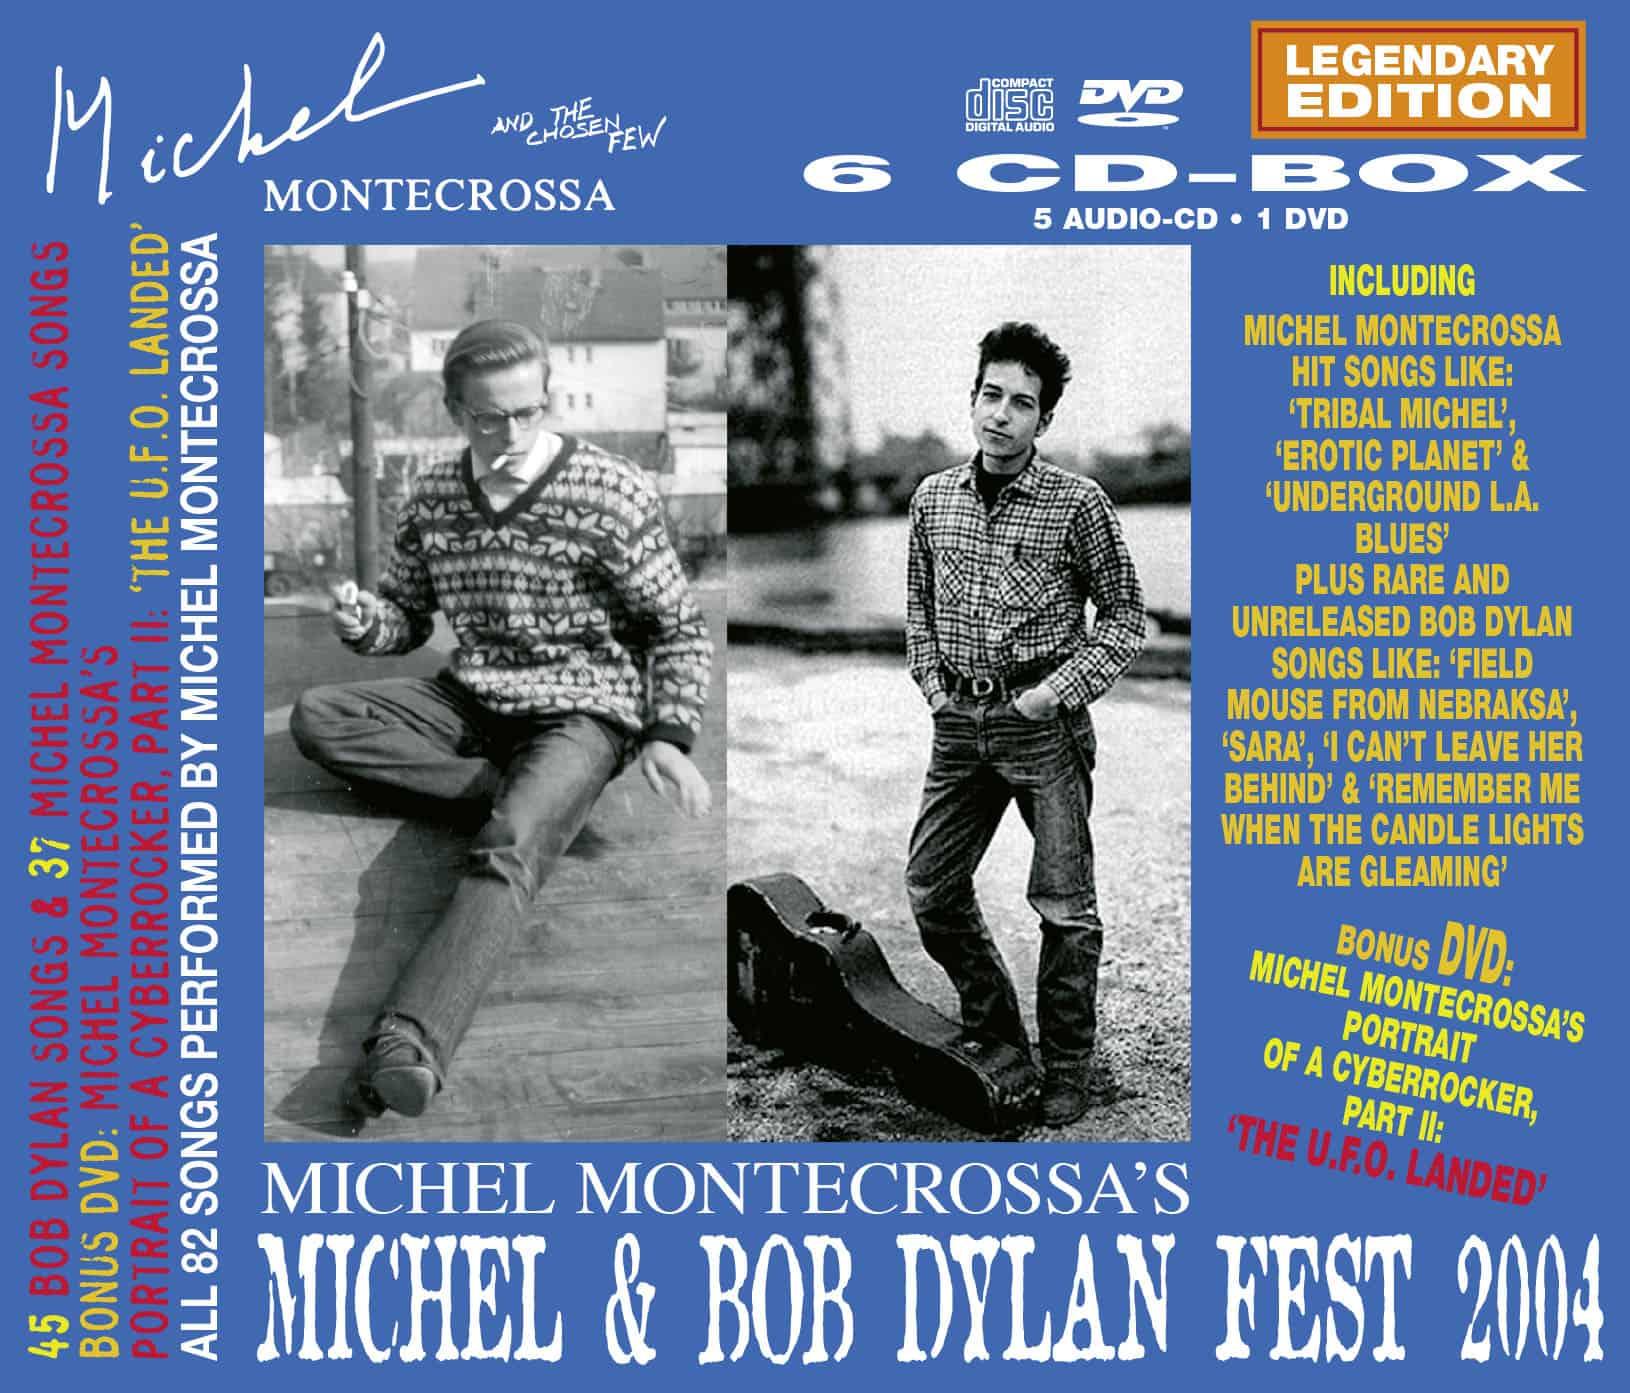 Michel Montecrossa's Michel & Bob Dylan Fest 2004, Legendary Edition